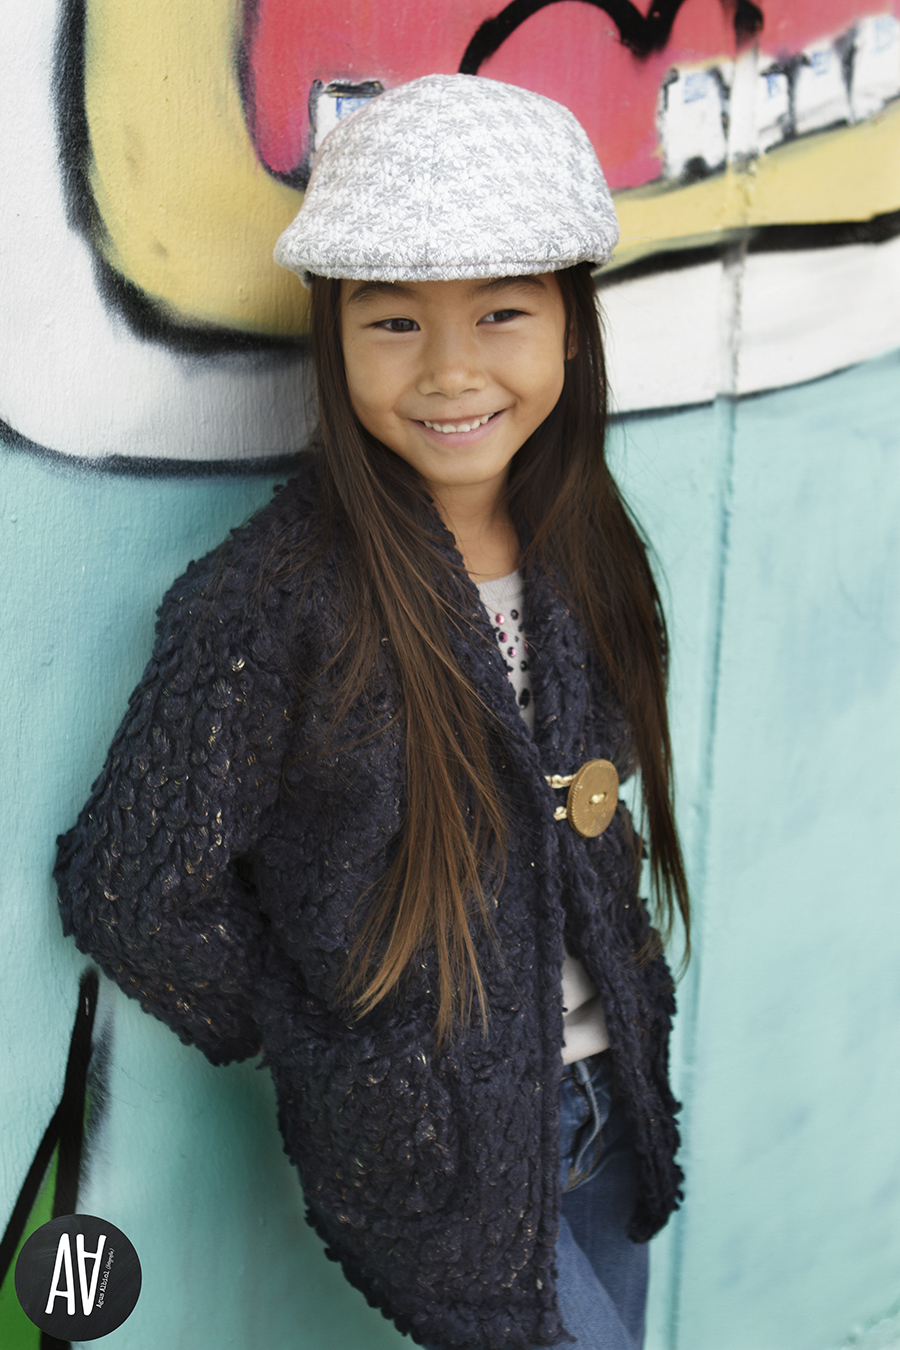 Agus Albiol Fotografia fotografa de moda street style trends & fashion mini Barcelona Elisabeth Puig ropa niños.5